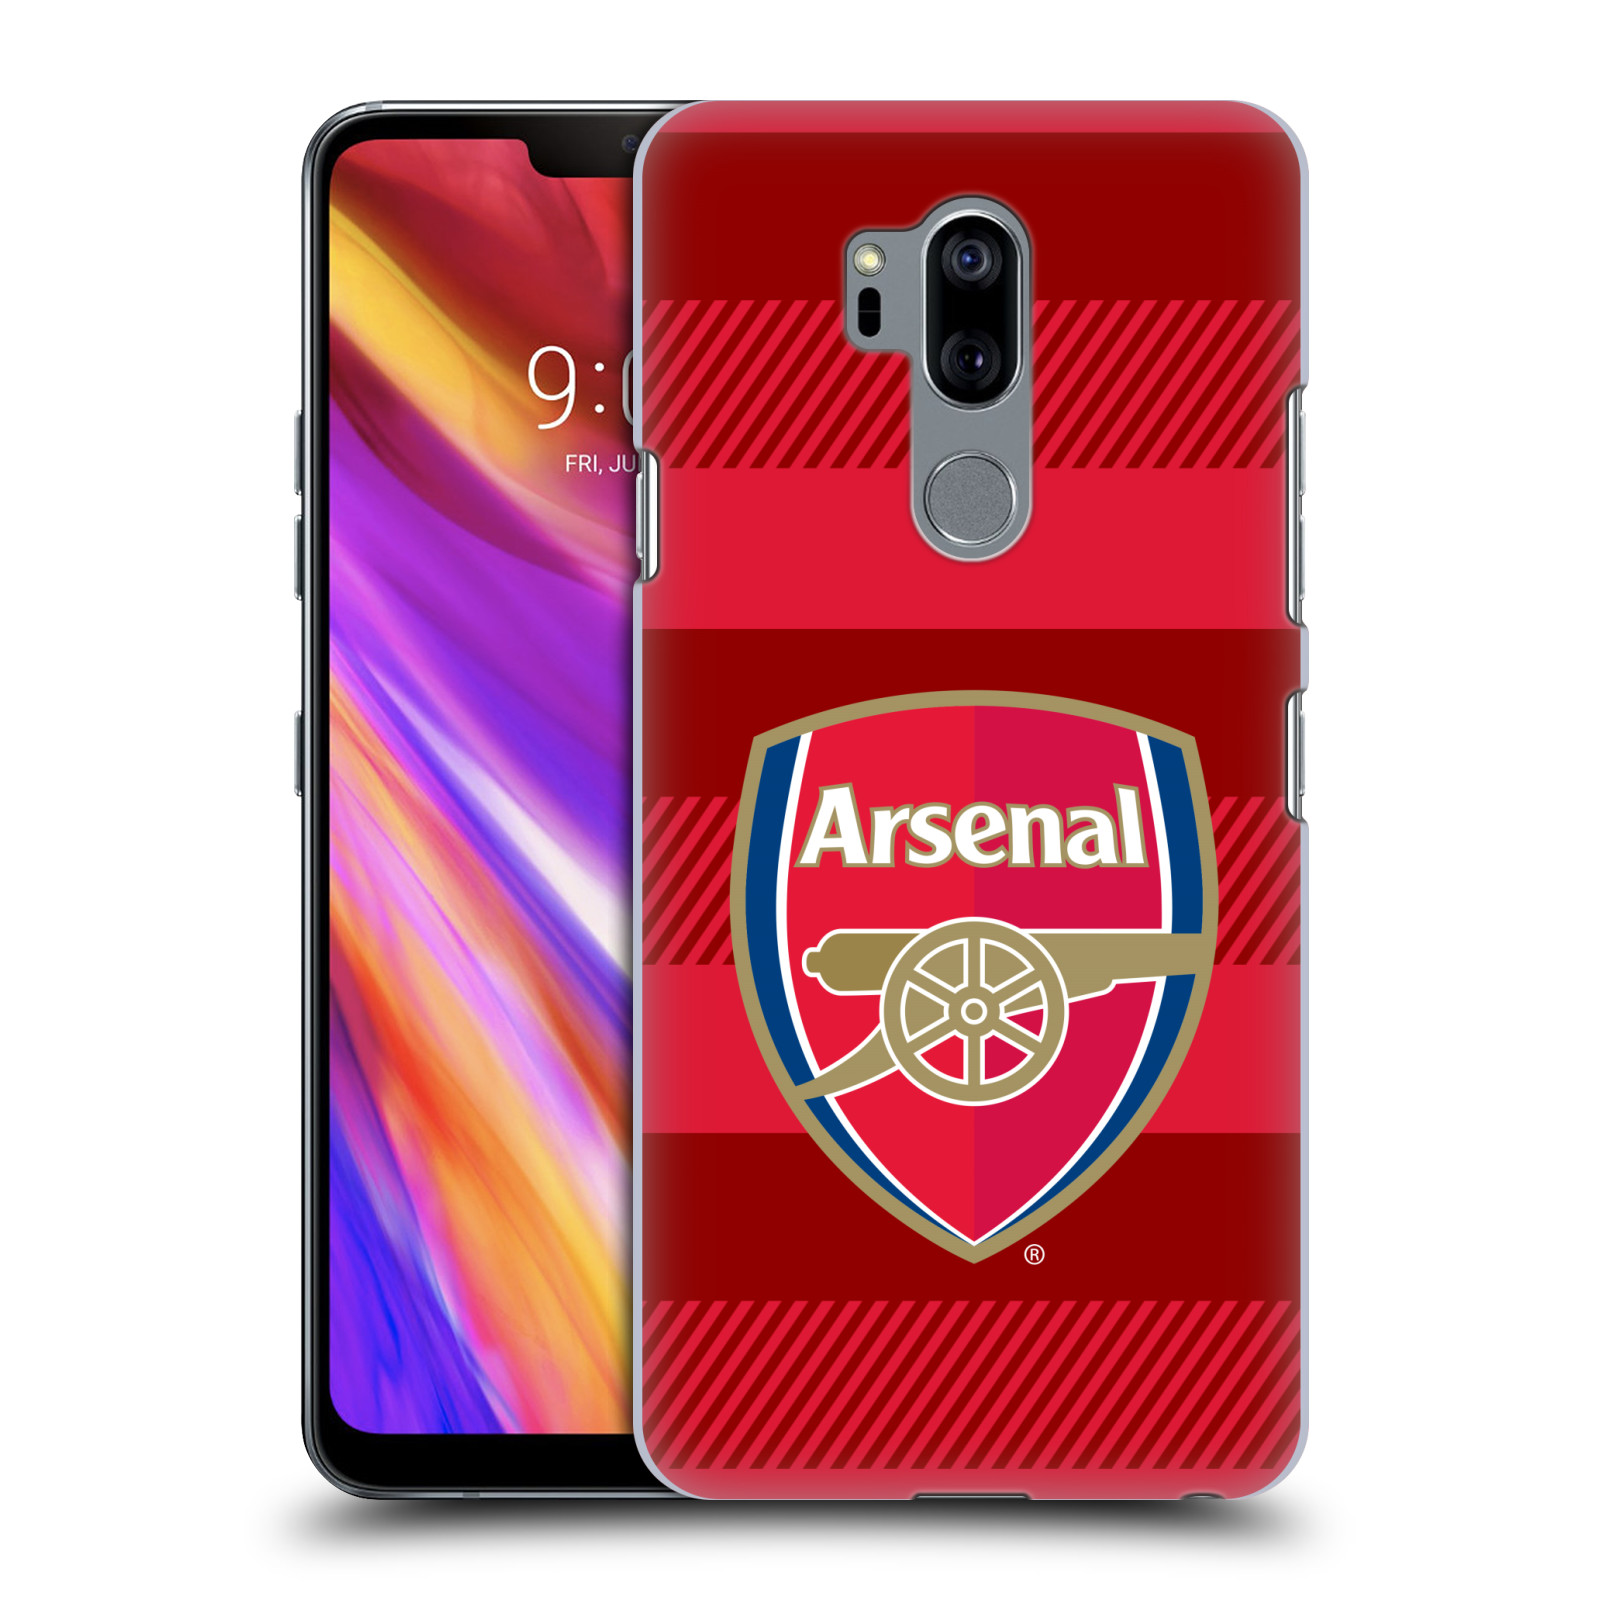 Plastové pouzdro na mobil LG G7 ThinQ - Head Case - Arsenal FC - Logo s pruhy